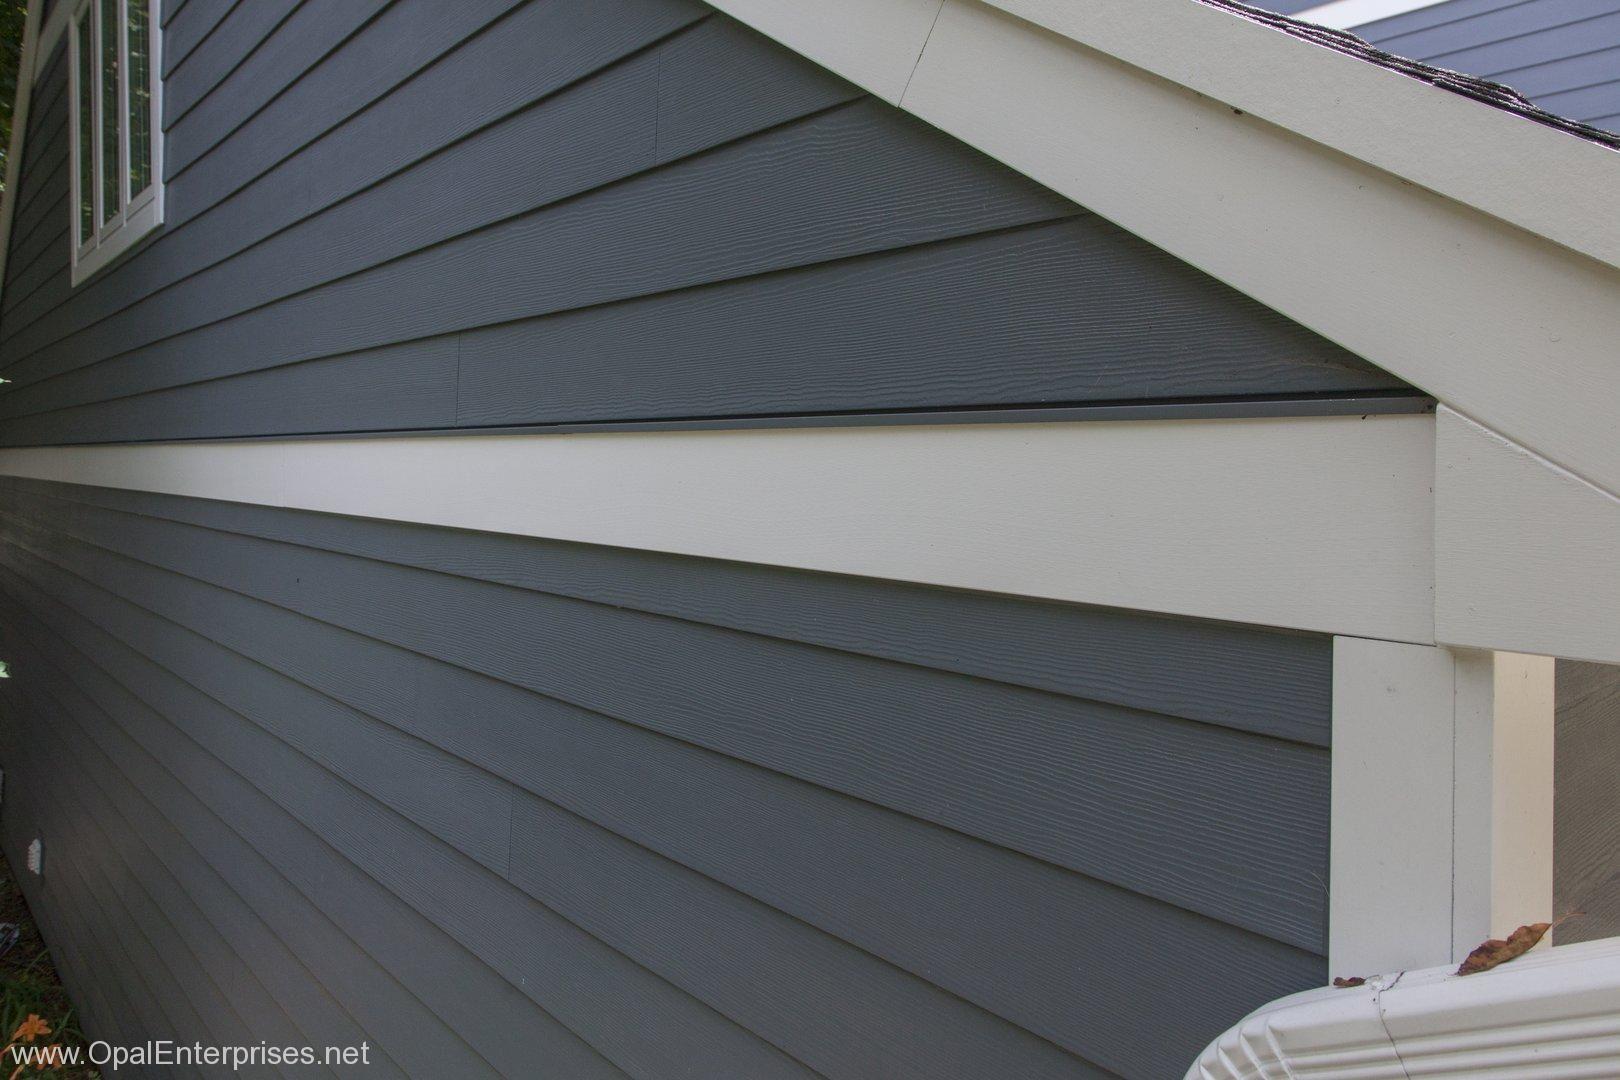 Side View Of Hardie Plank Siding Hardie Siding Exterior House Renovation Siding